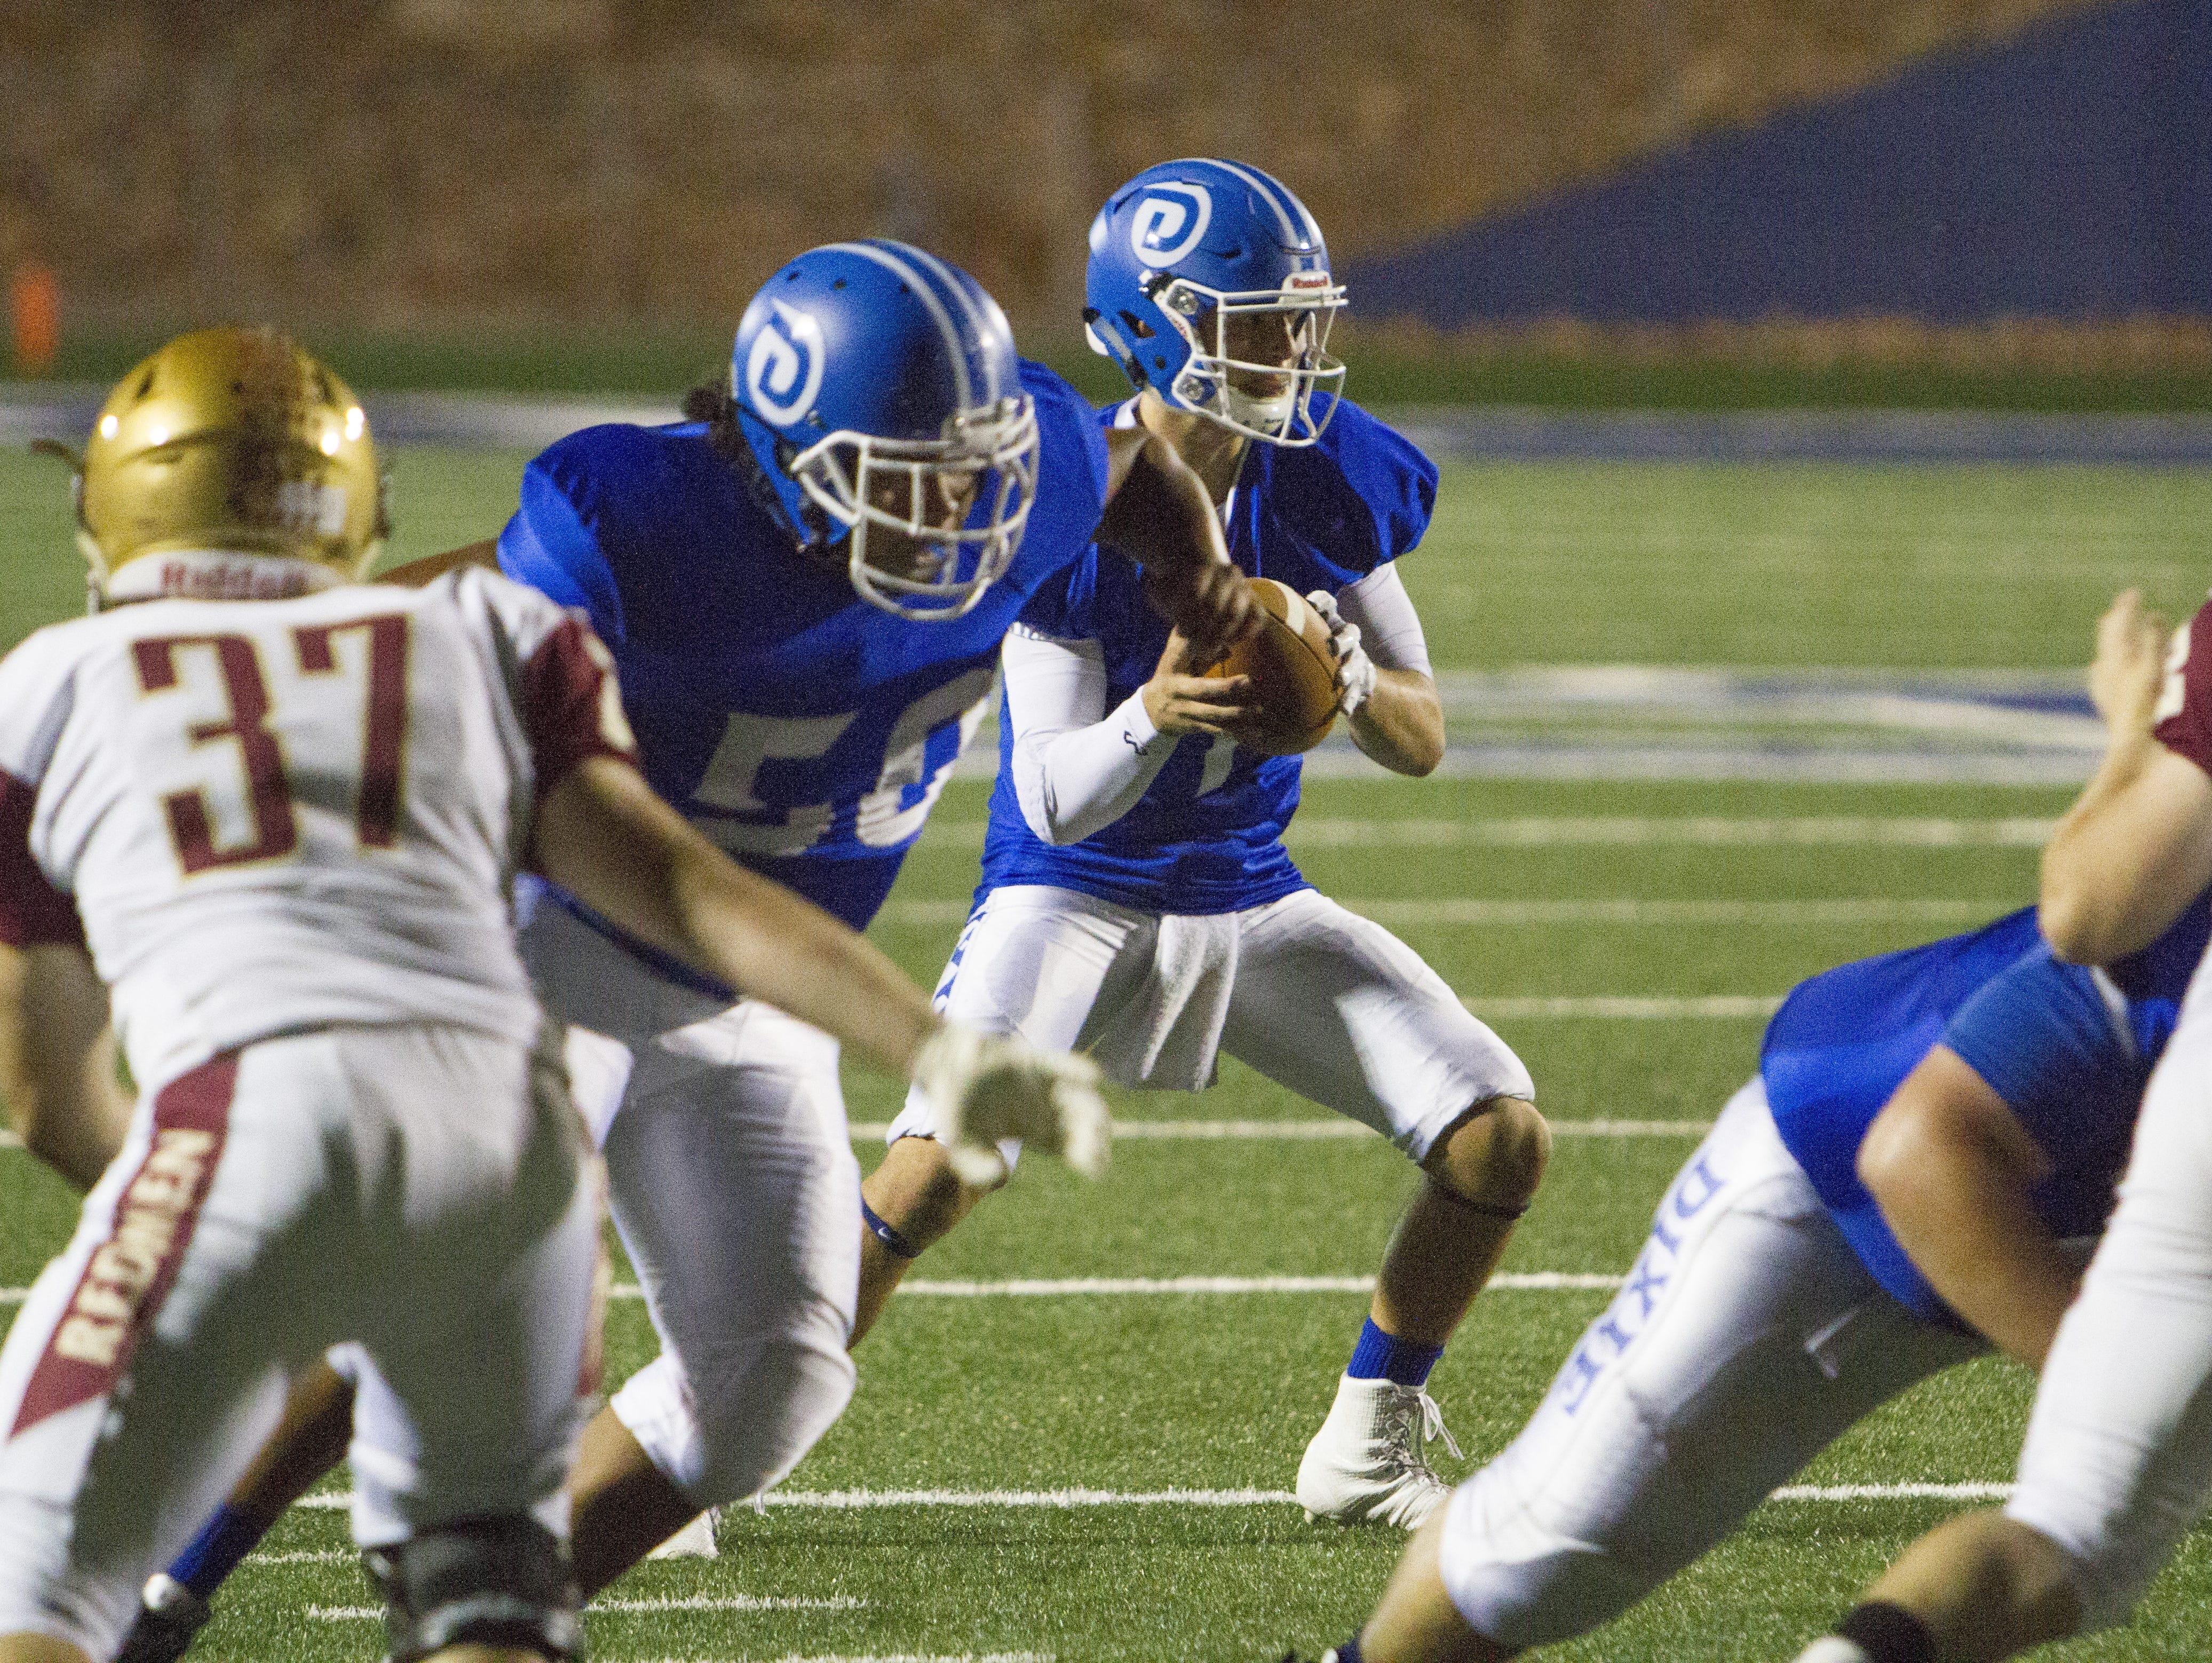 Dixie quarterback Zak Harrah has 18 touchdown passes and one interception through six games in 2015.